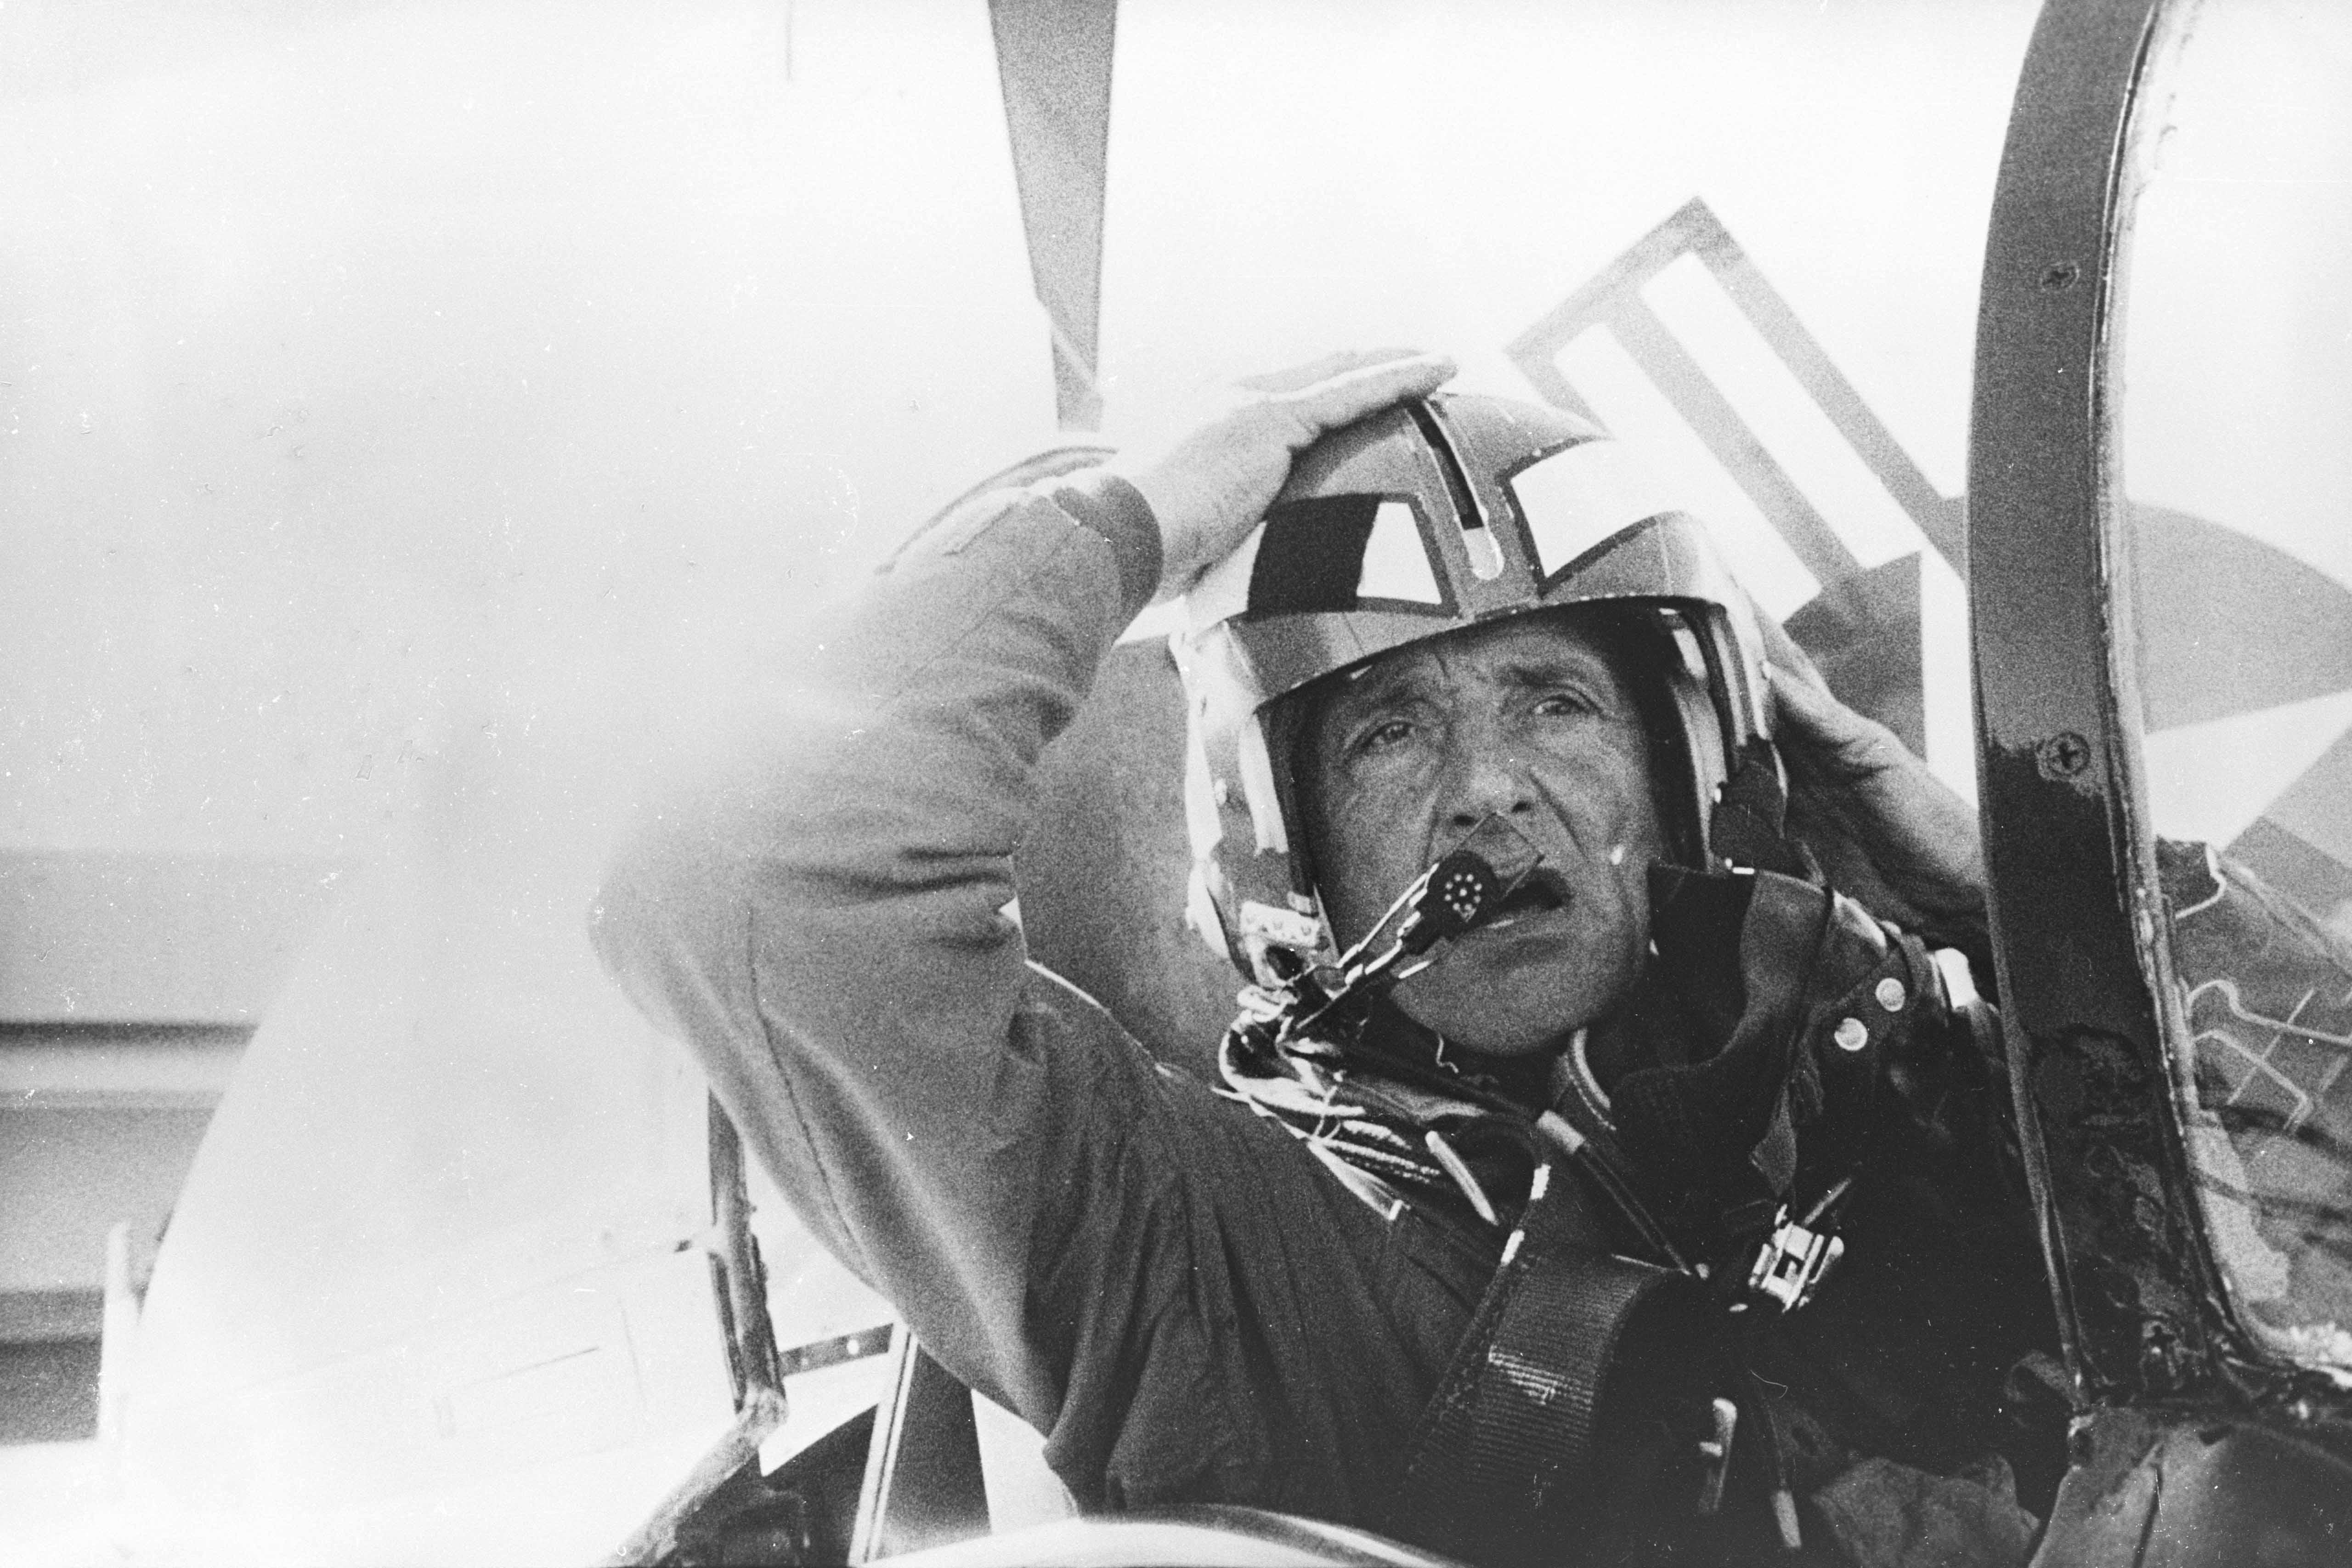 Szenenfoto aus dem Film Little Dieter Needs to Fly / Flucht aus Laos (Höllenfahrten, 1. Folge)